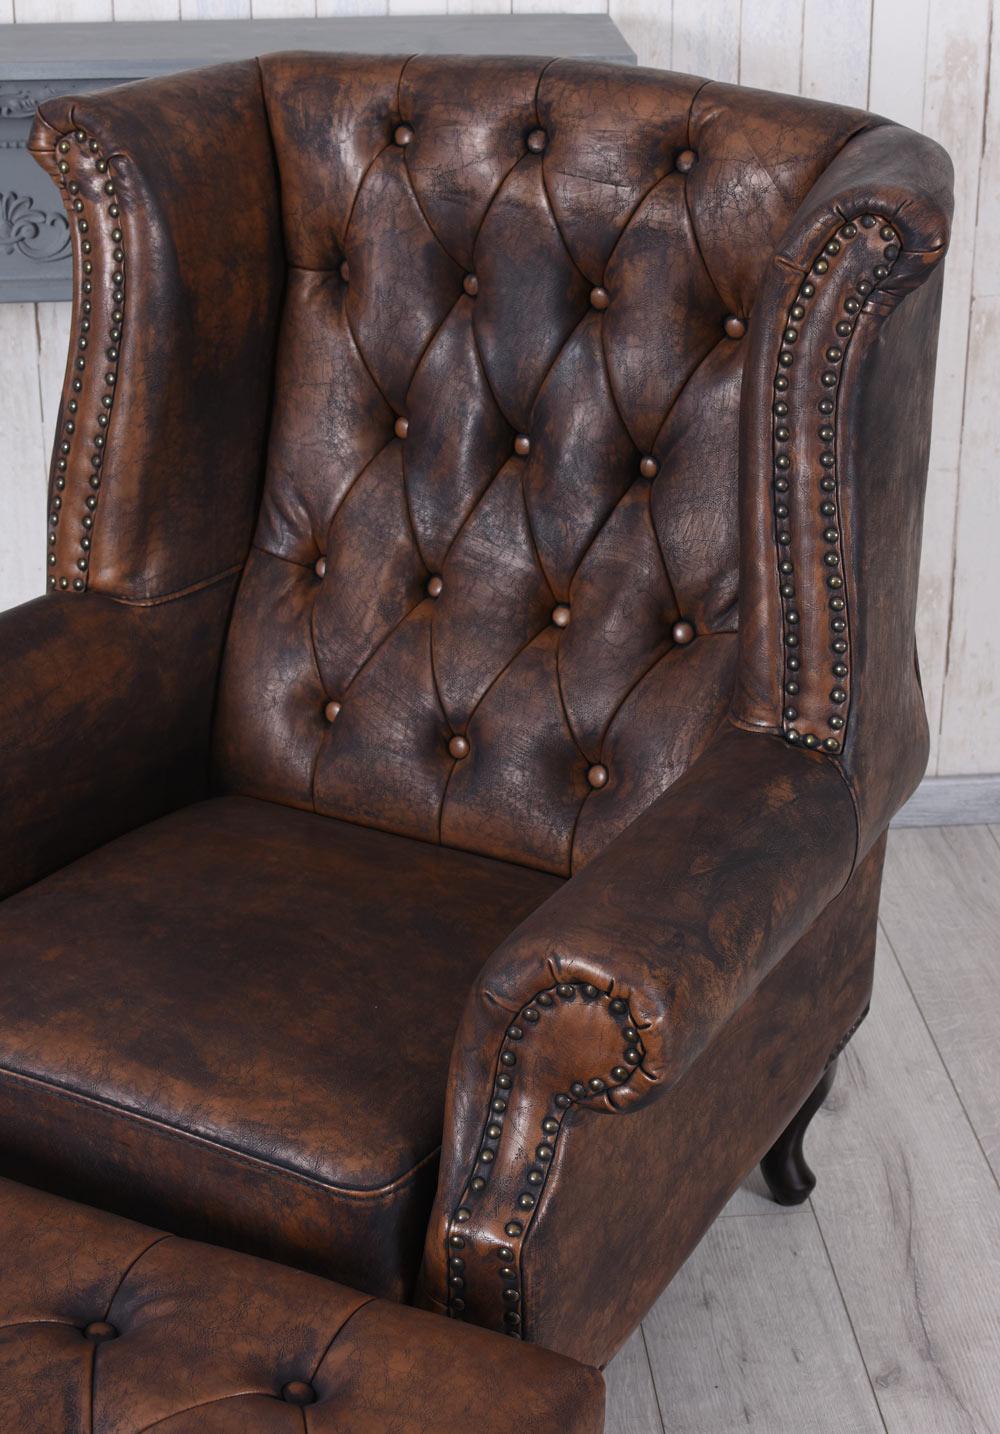 englischer sessel mit hocker ohrensessel kaminsessel antik fernsehsessel ottoman ebay. Black Bedroom Furniture Sets. Home Design Ideas